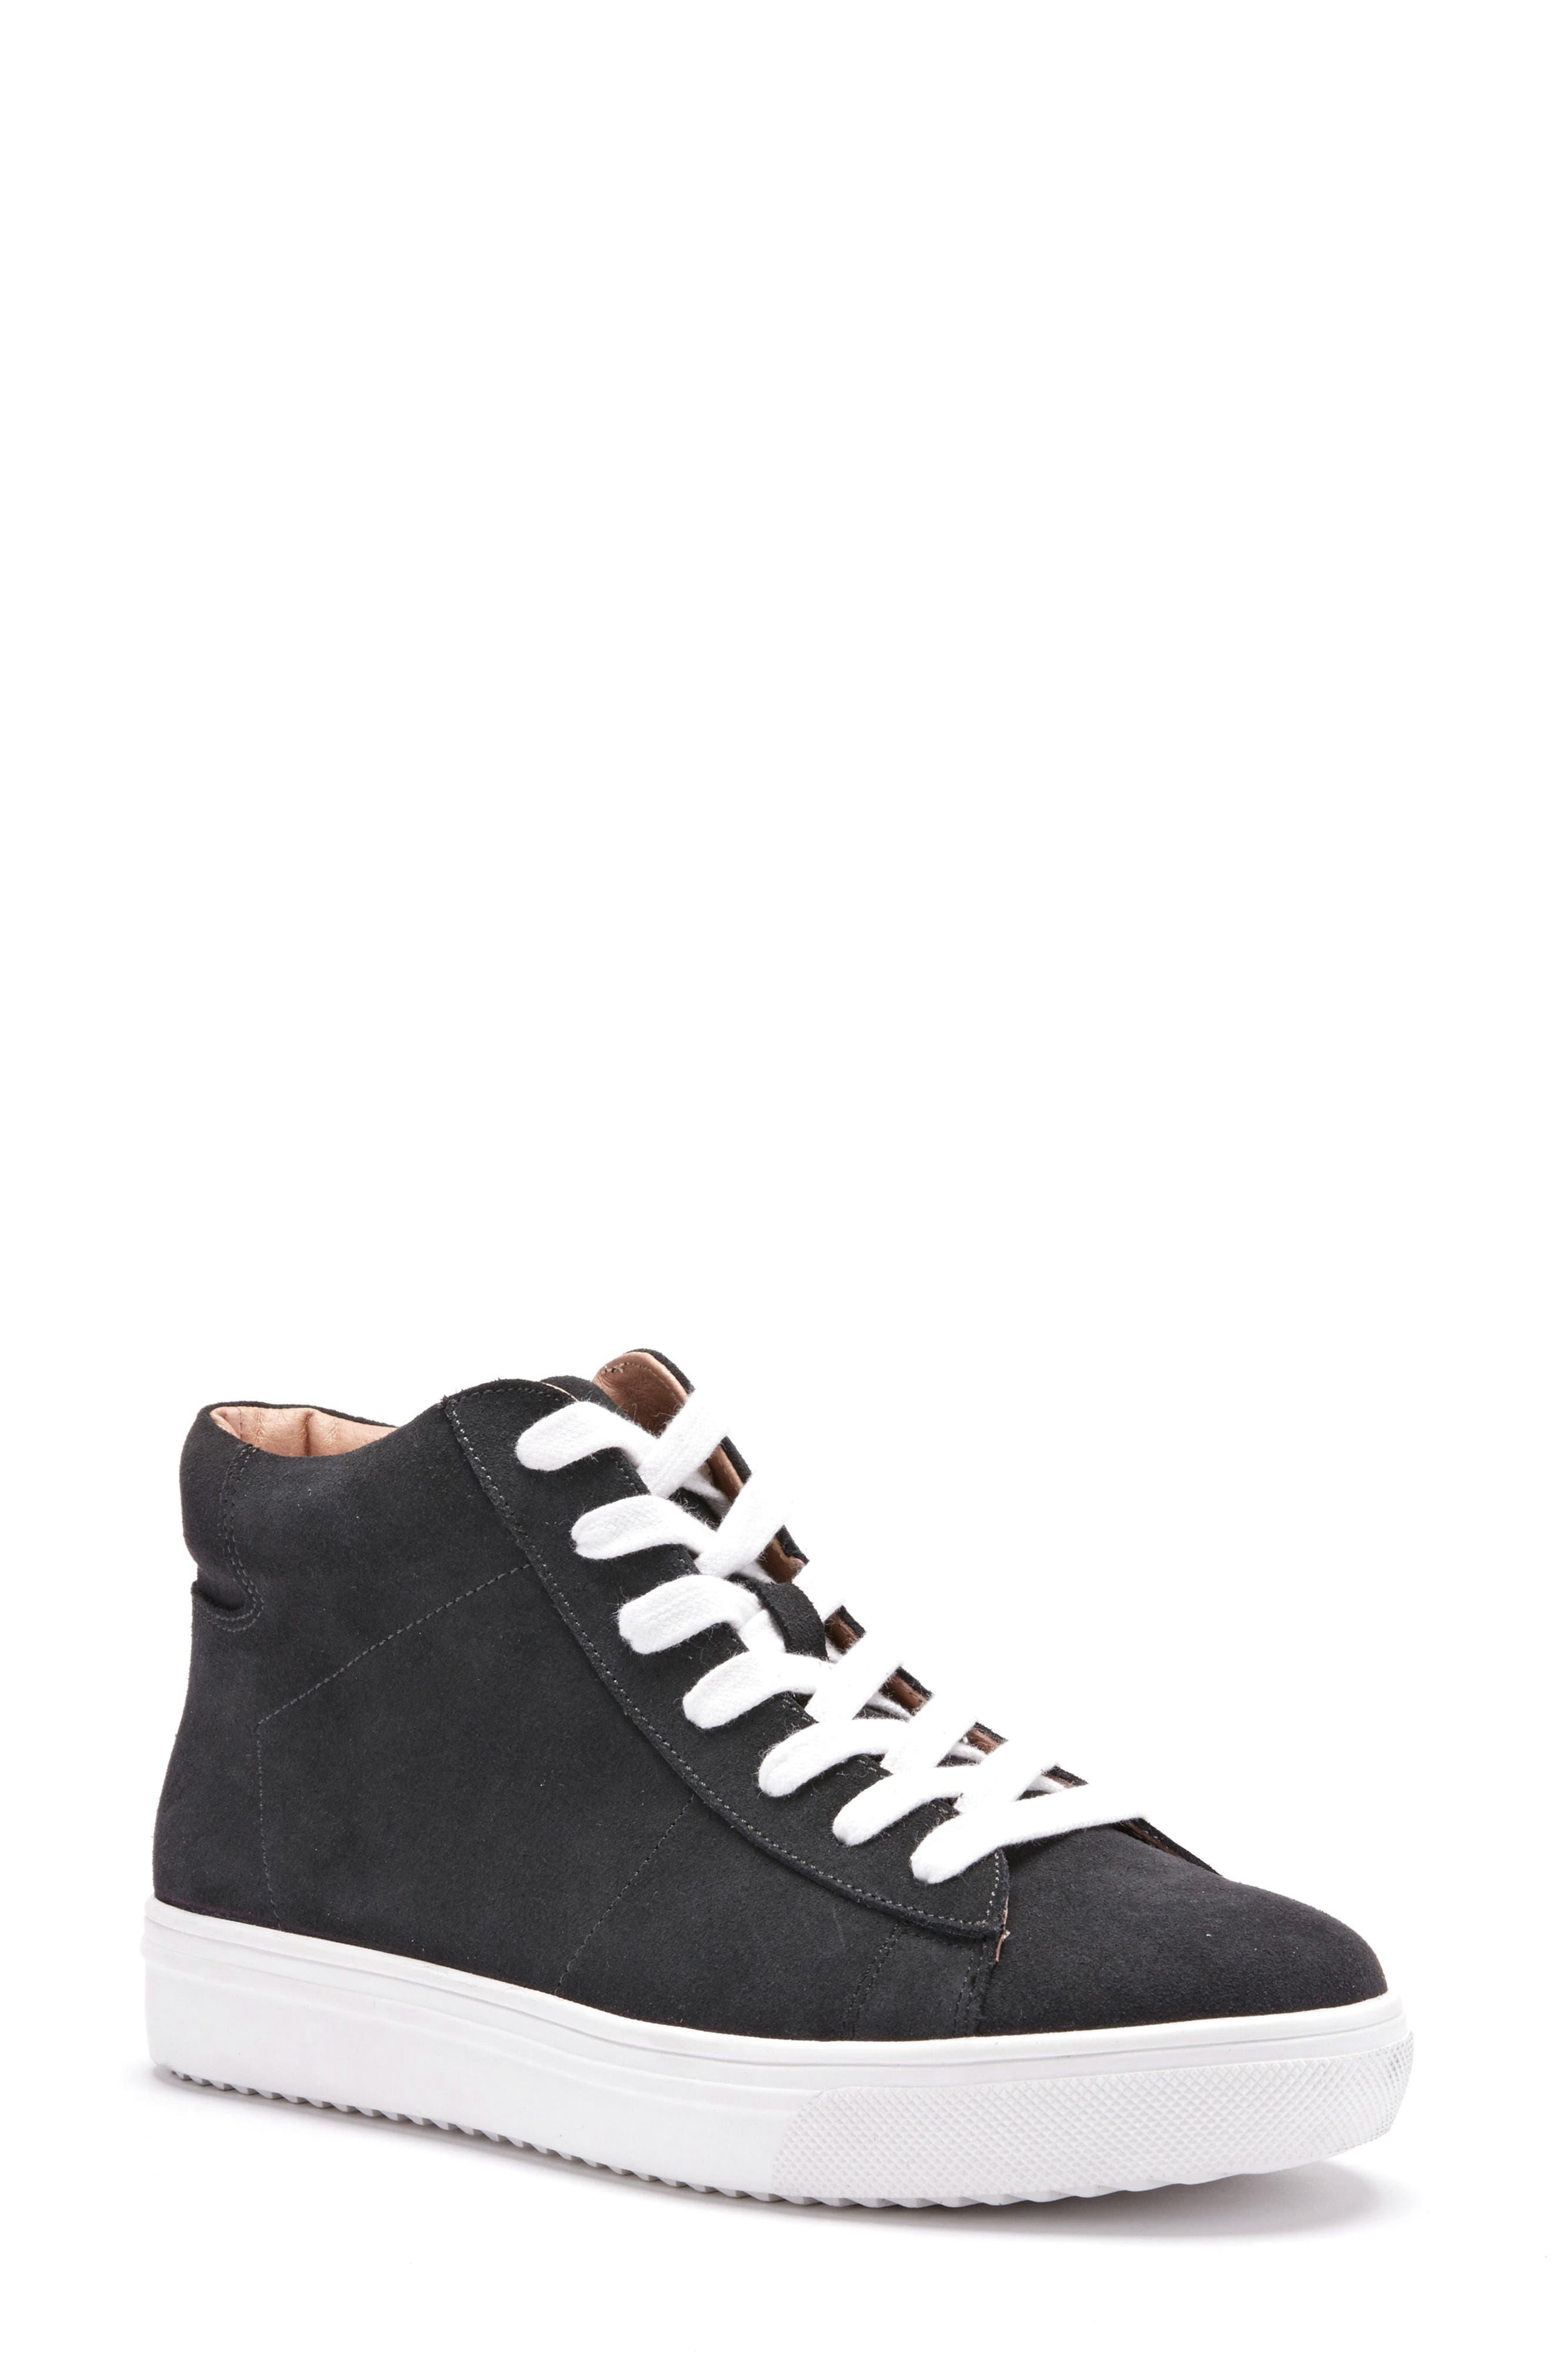 Jax Waterproof High Top Sneaker,                             Main thumbnail 2, color,